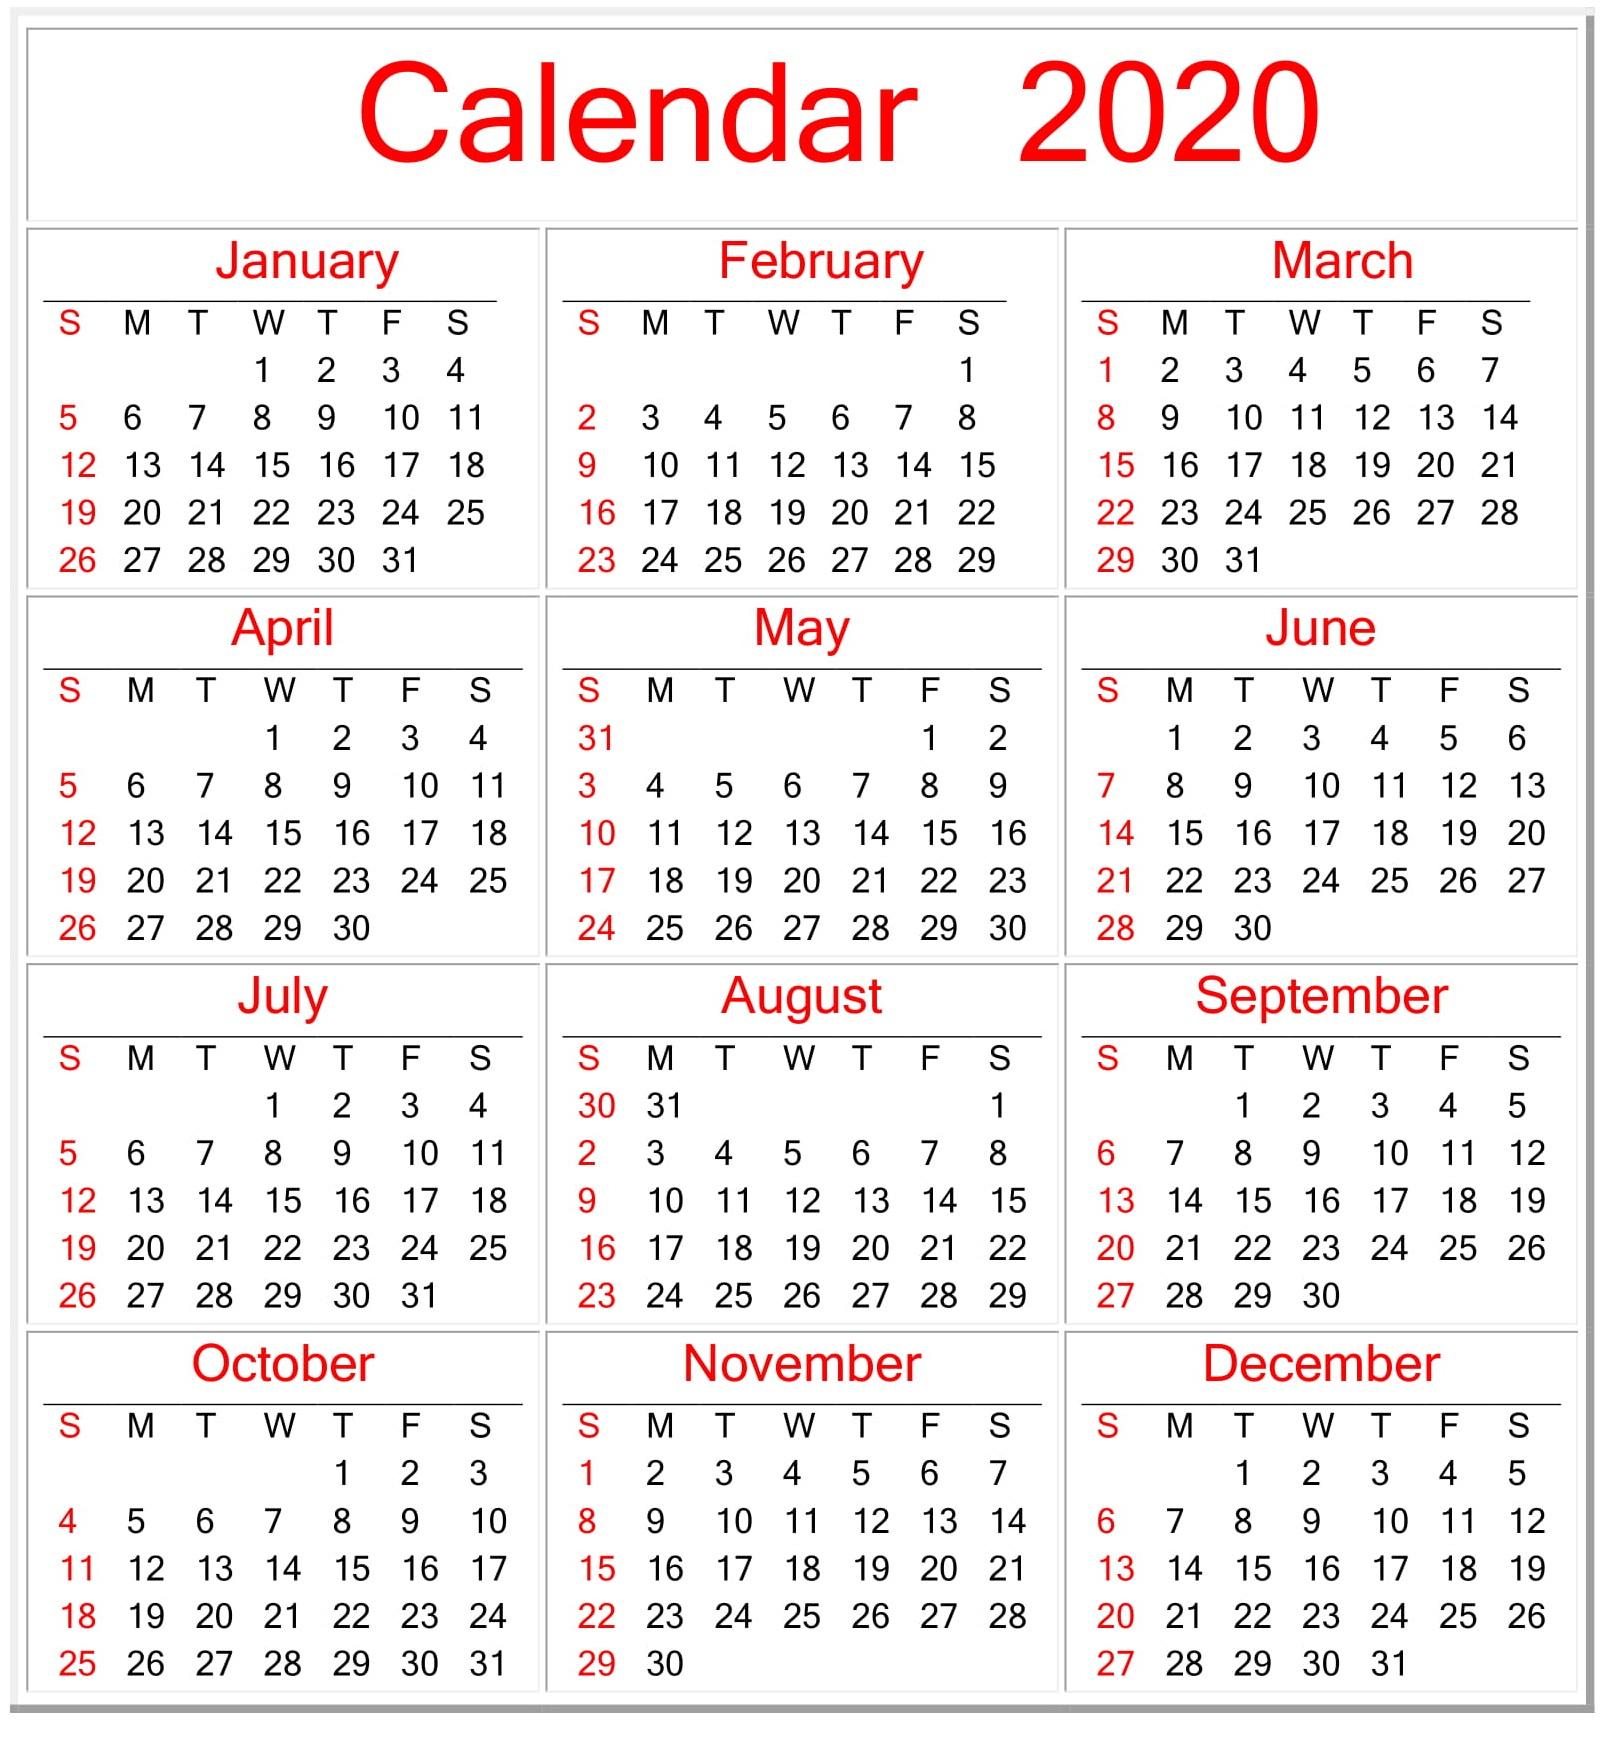 Printable Calendar 2020 Pdf Template – Free Latest Calendar intended for Free Printable 2020 Attendance Calendar